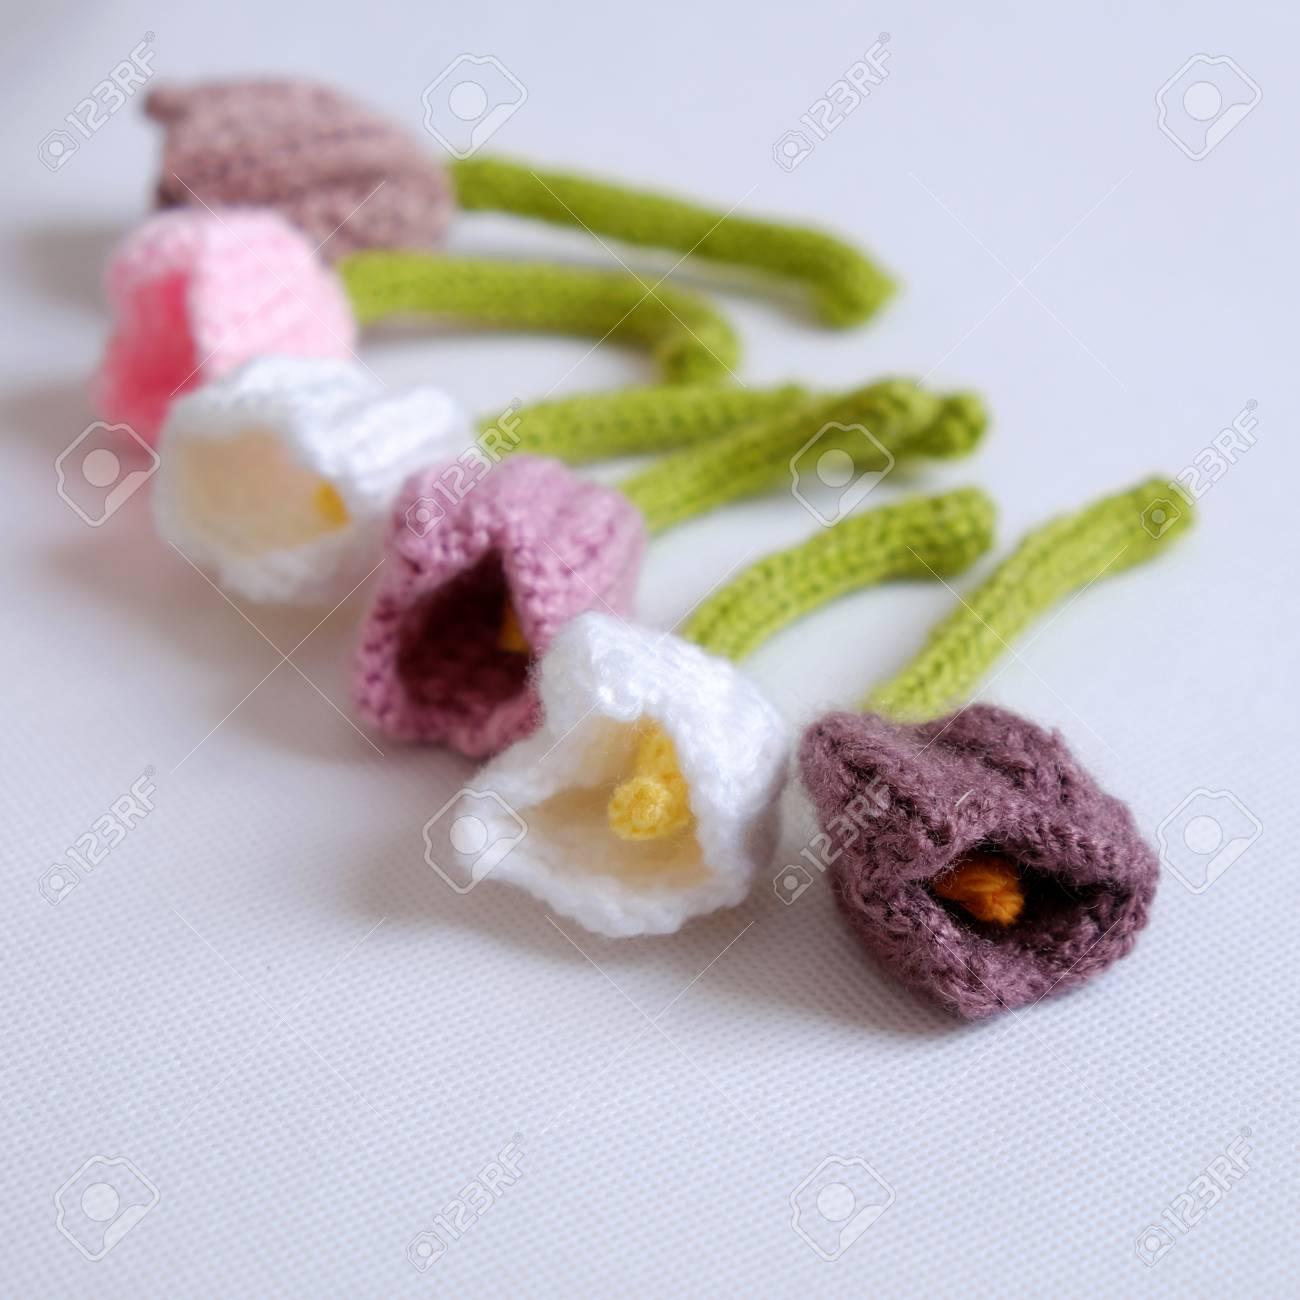 Knit, Knitting, Knitted, Yarn, Wool, Handmade, Hand Made, Homemade ...